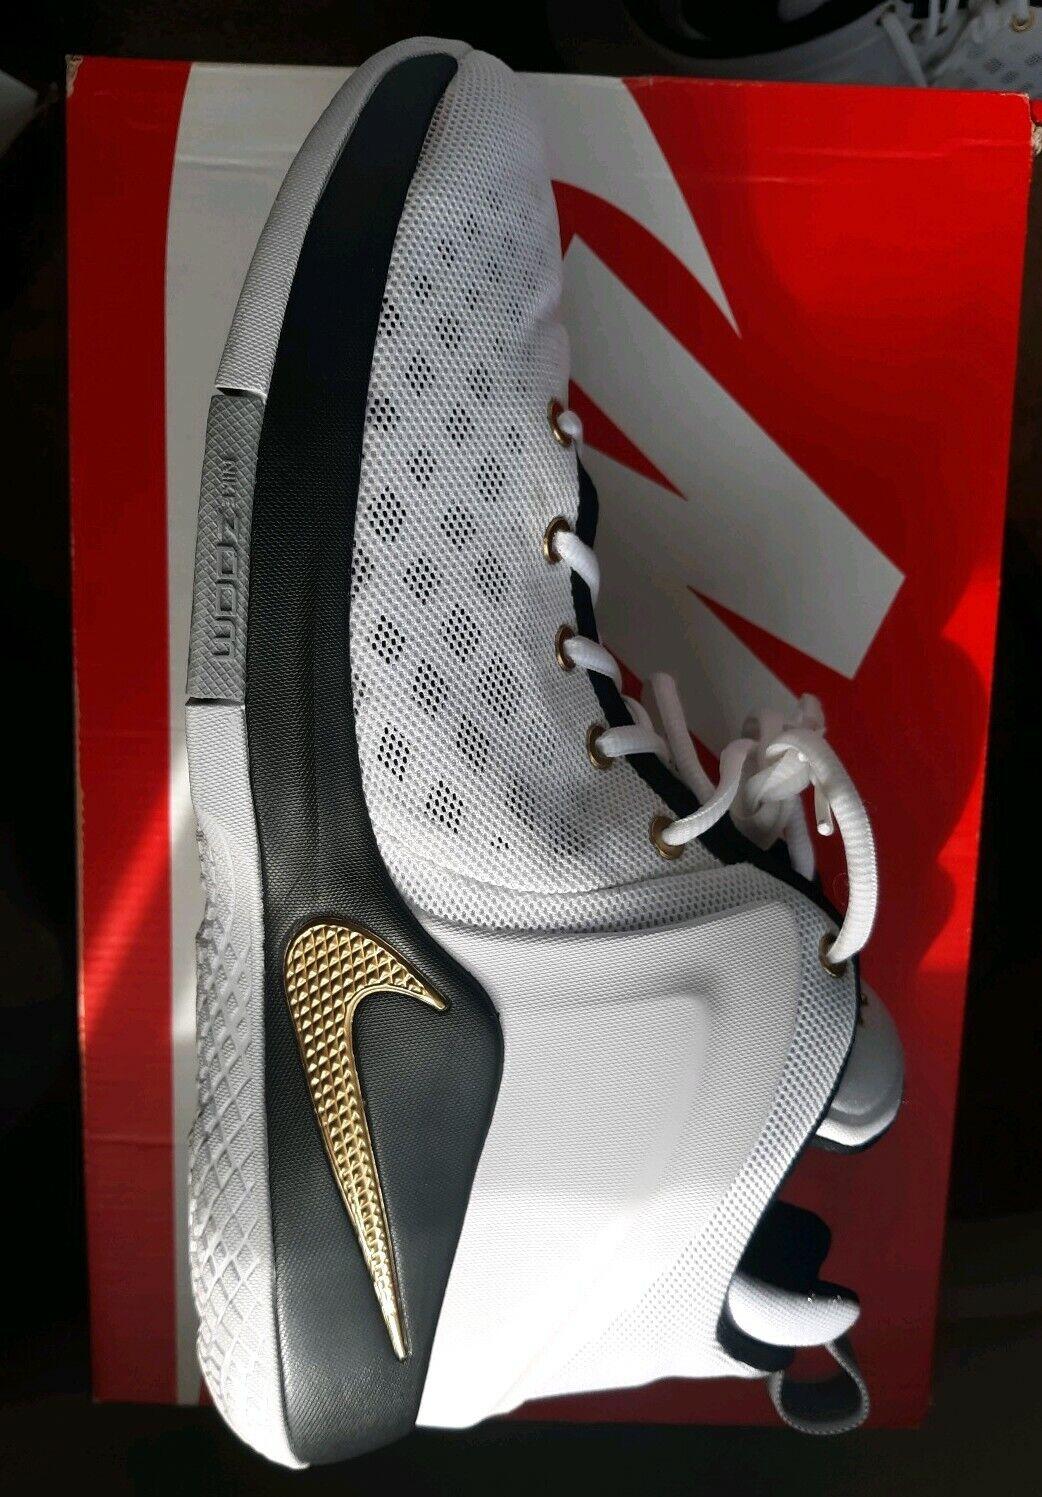 22faf957c139 Nike ZOOM WITNESS Lebron Men s Sneakers White